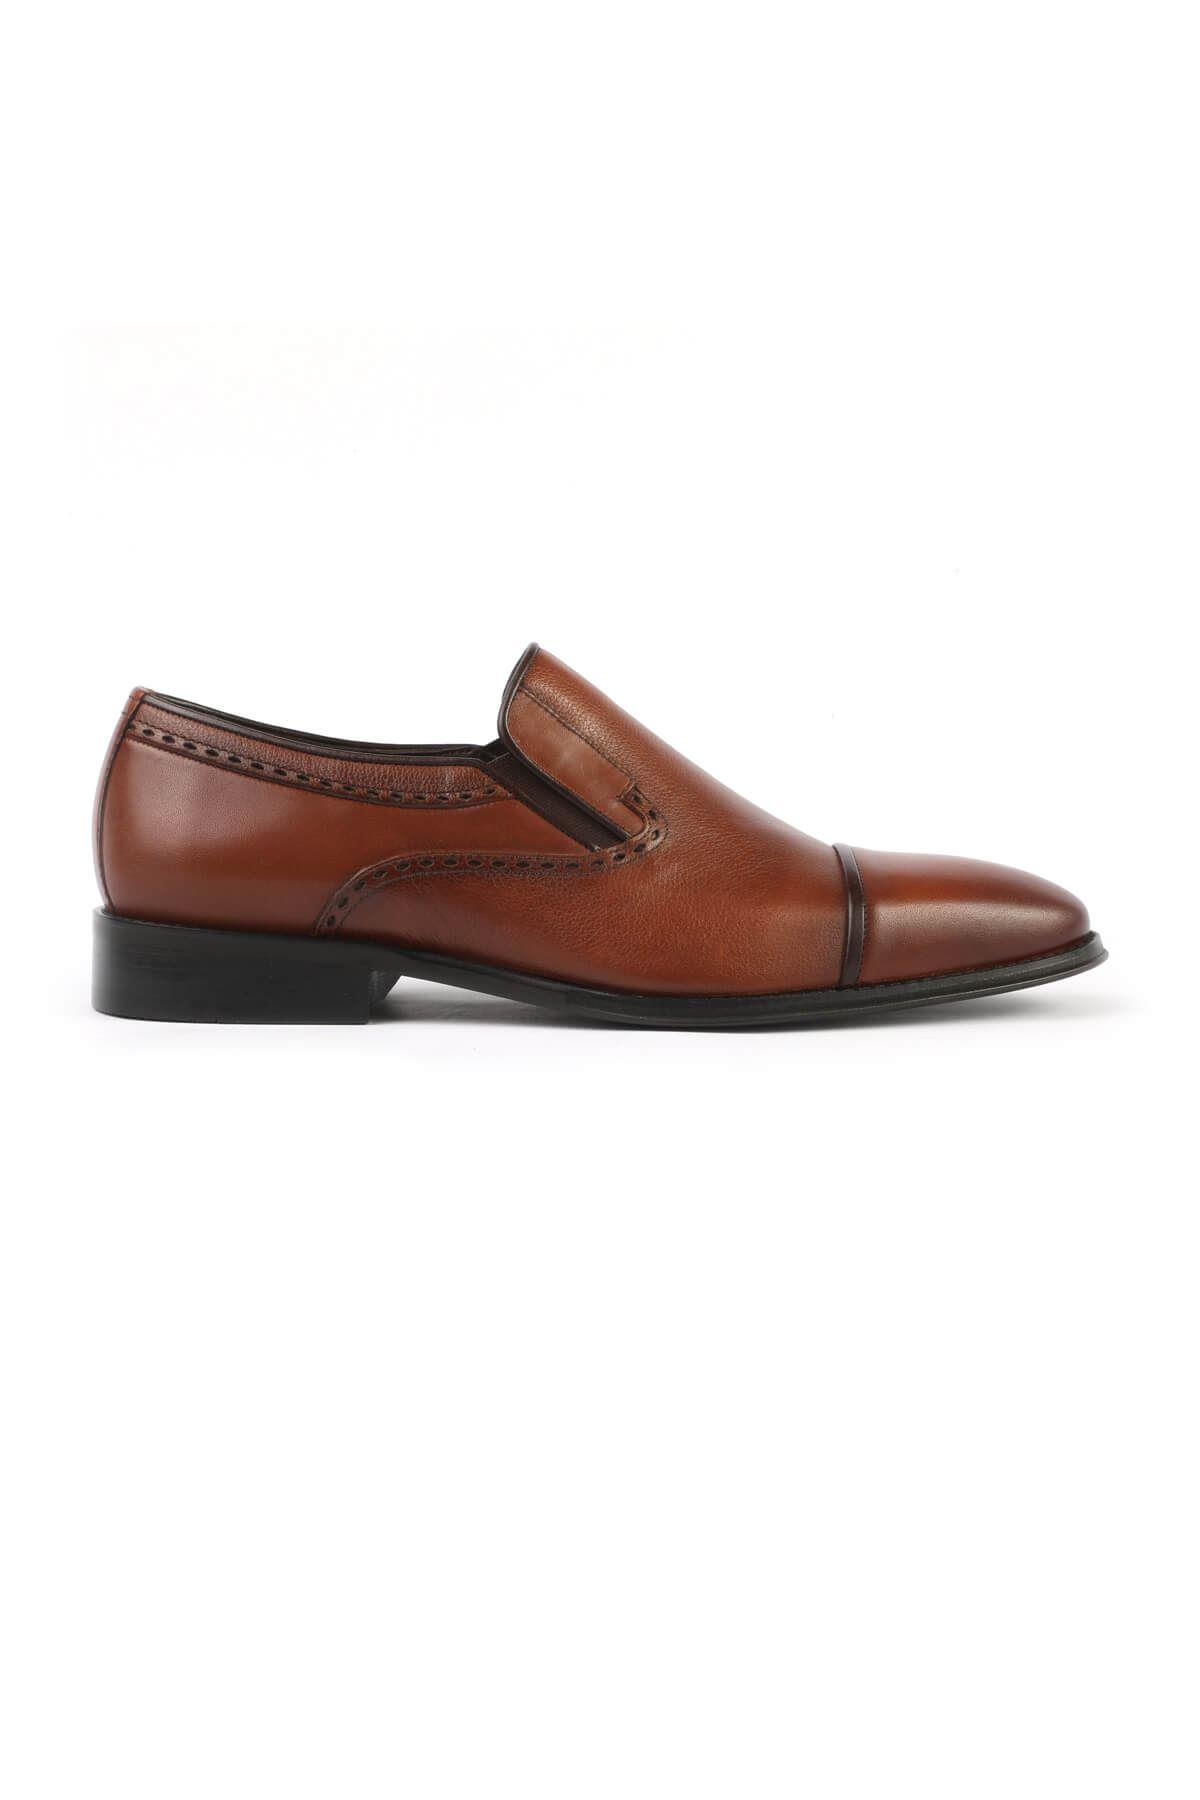 Libero 2883 Tan Classic Shoes